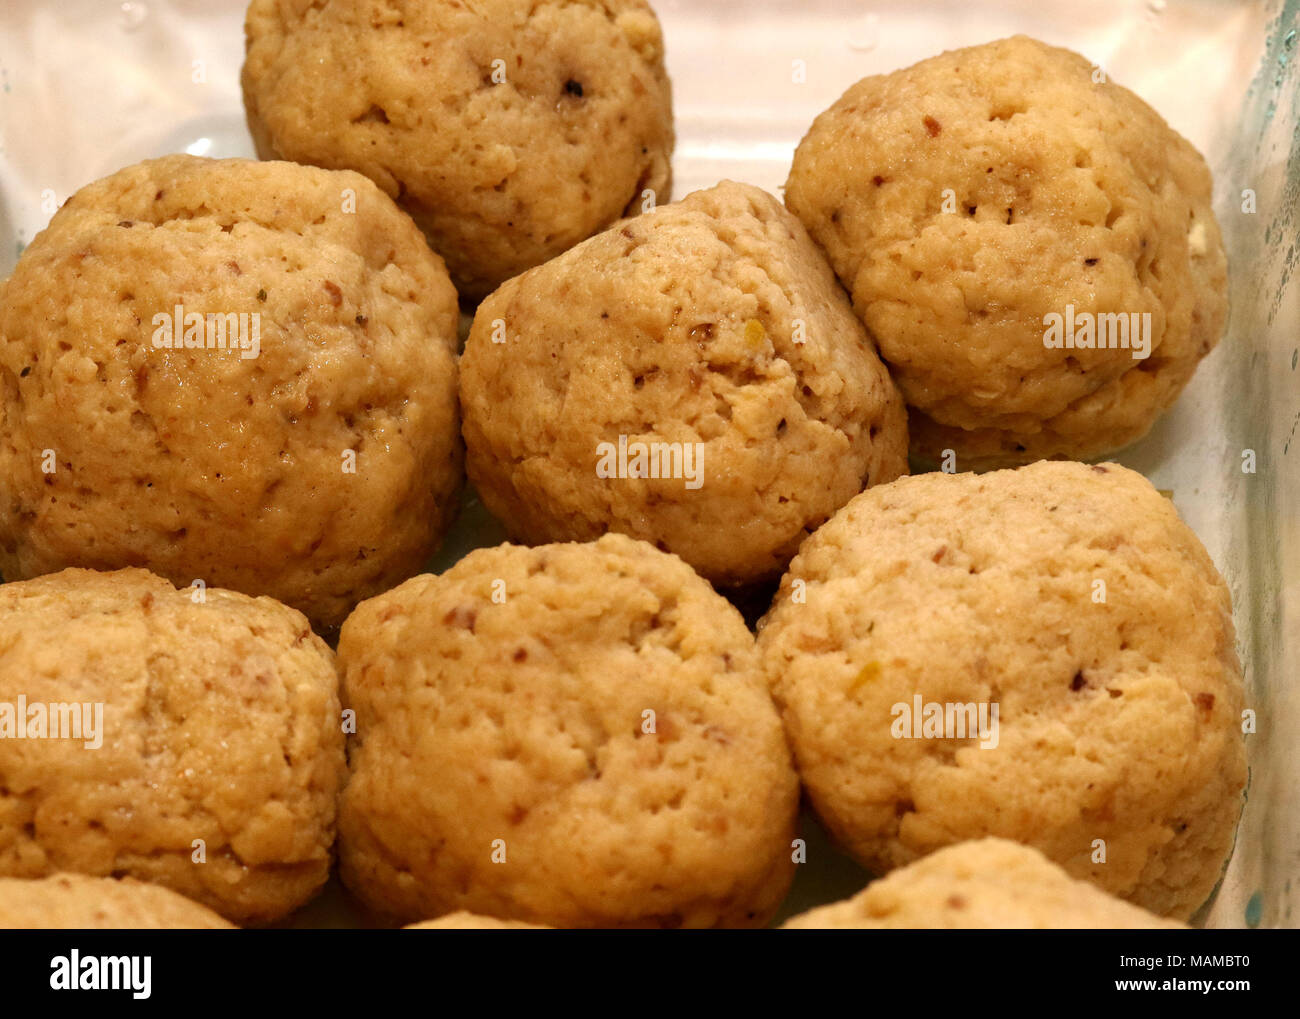 Matzah balls in a dish - Stock Image